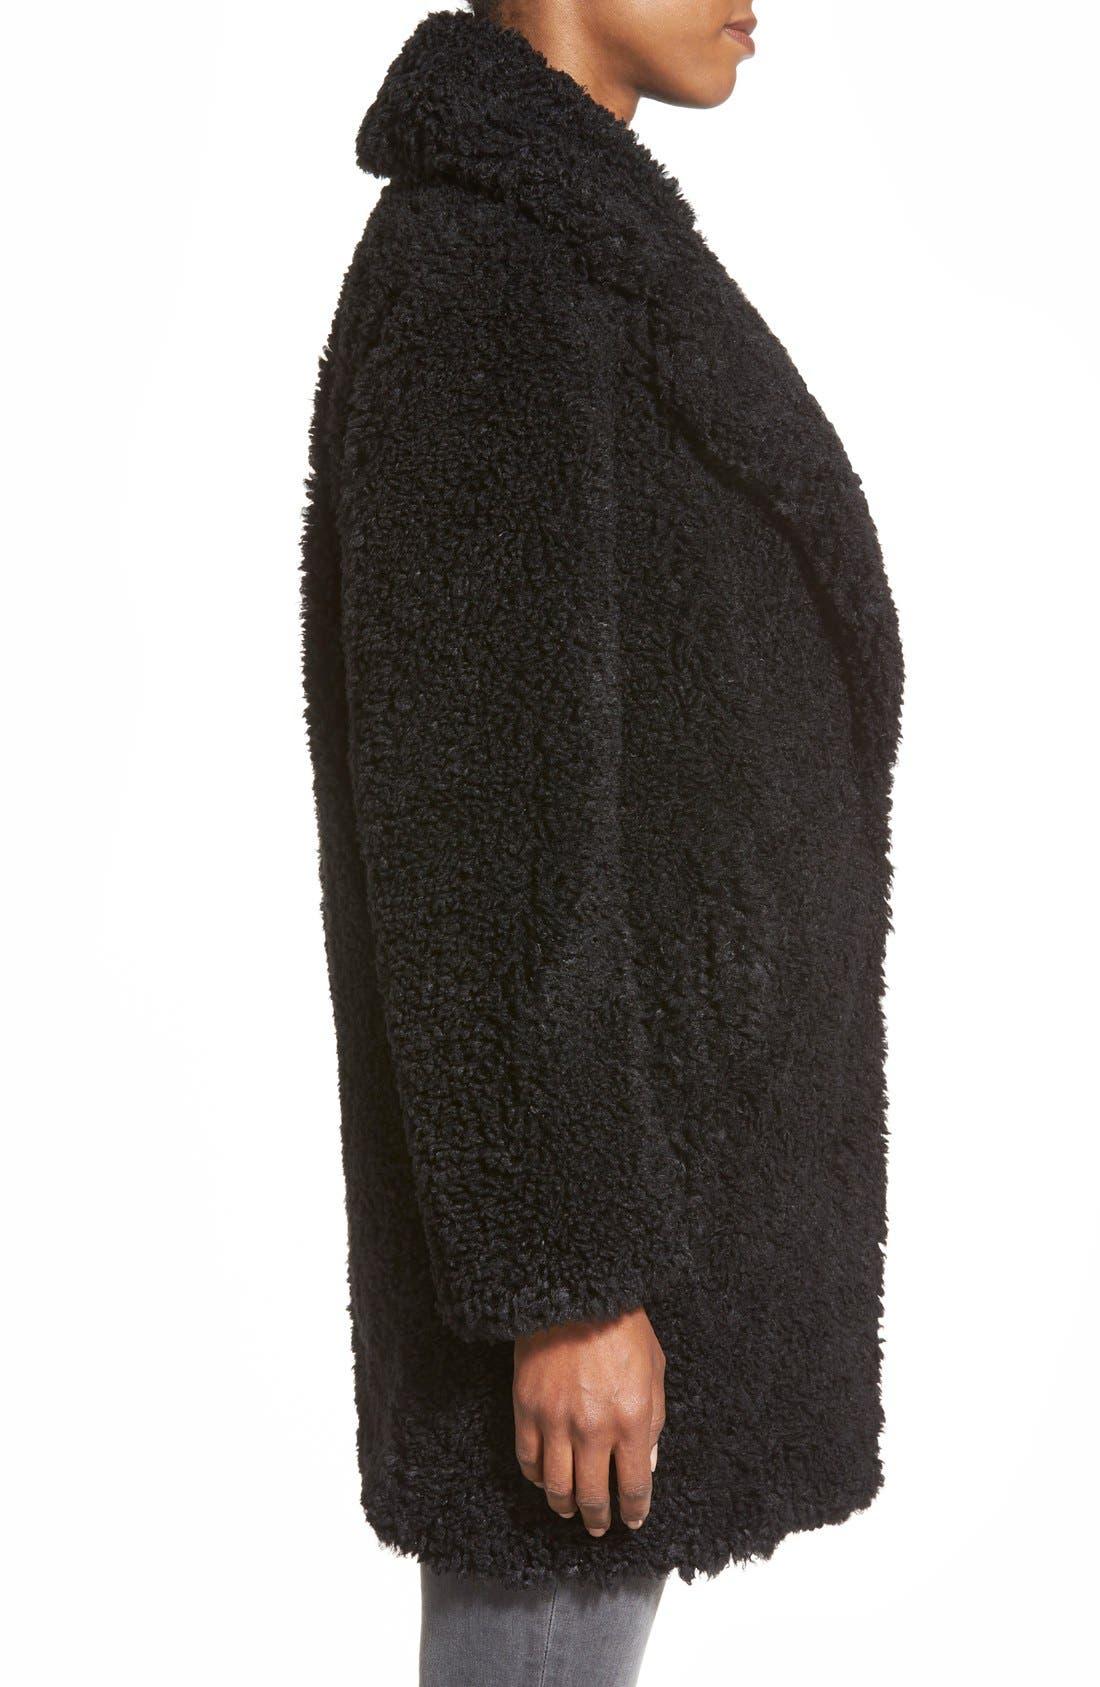 KENSIE,                             'Teddy Bear' Notch Collar Reversible Faux Fur Coat,                             Alternate thumbnail 4, color,                             001